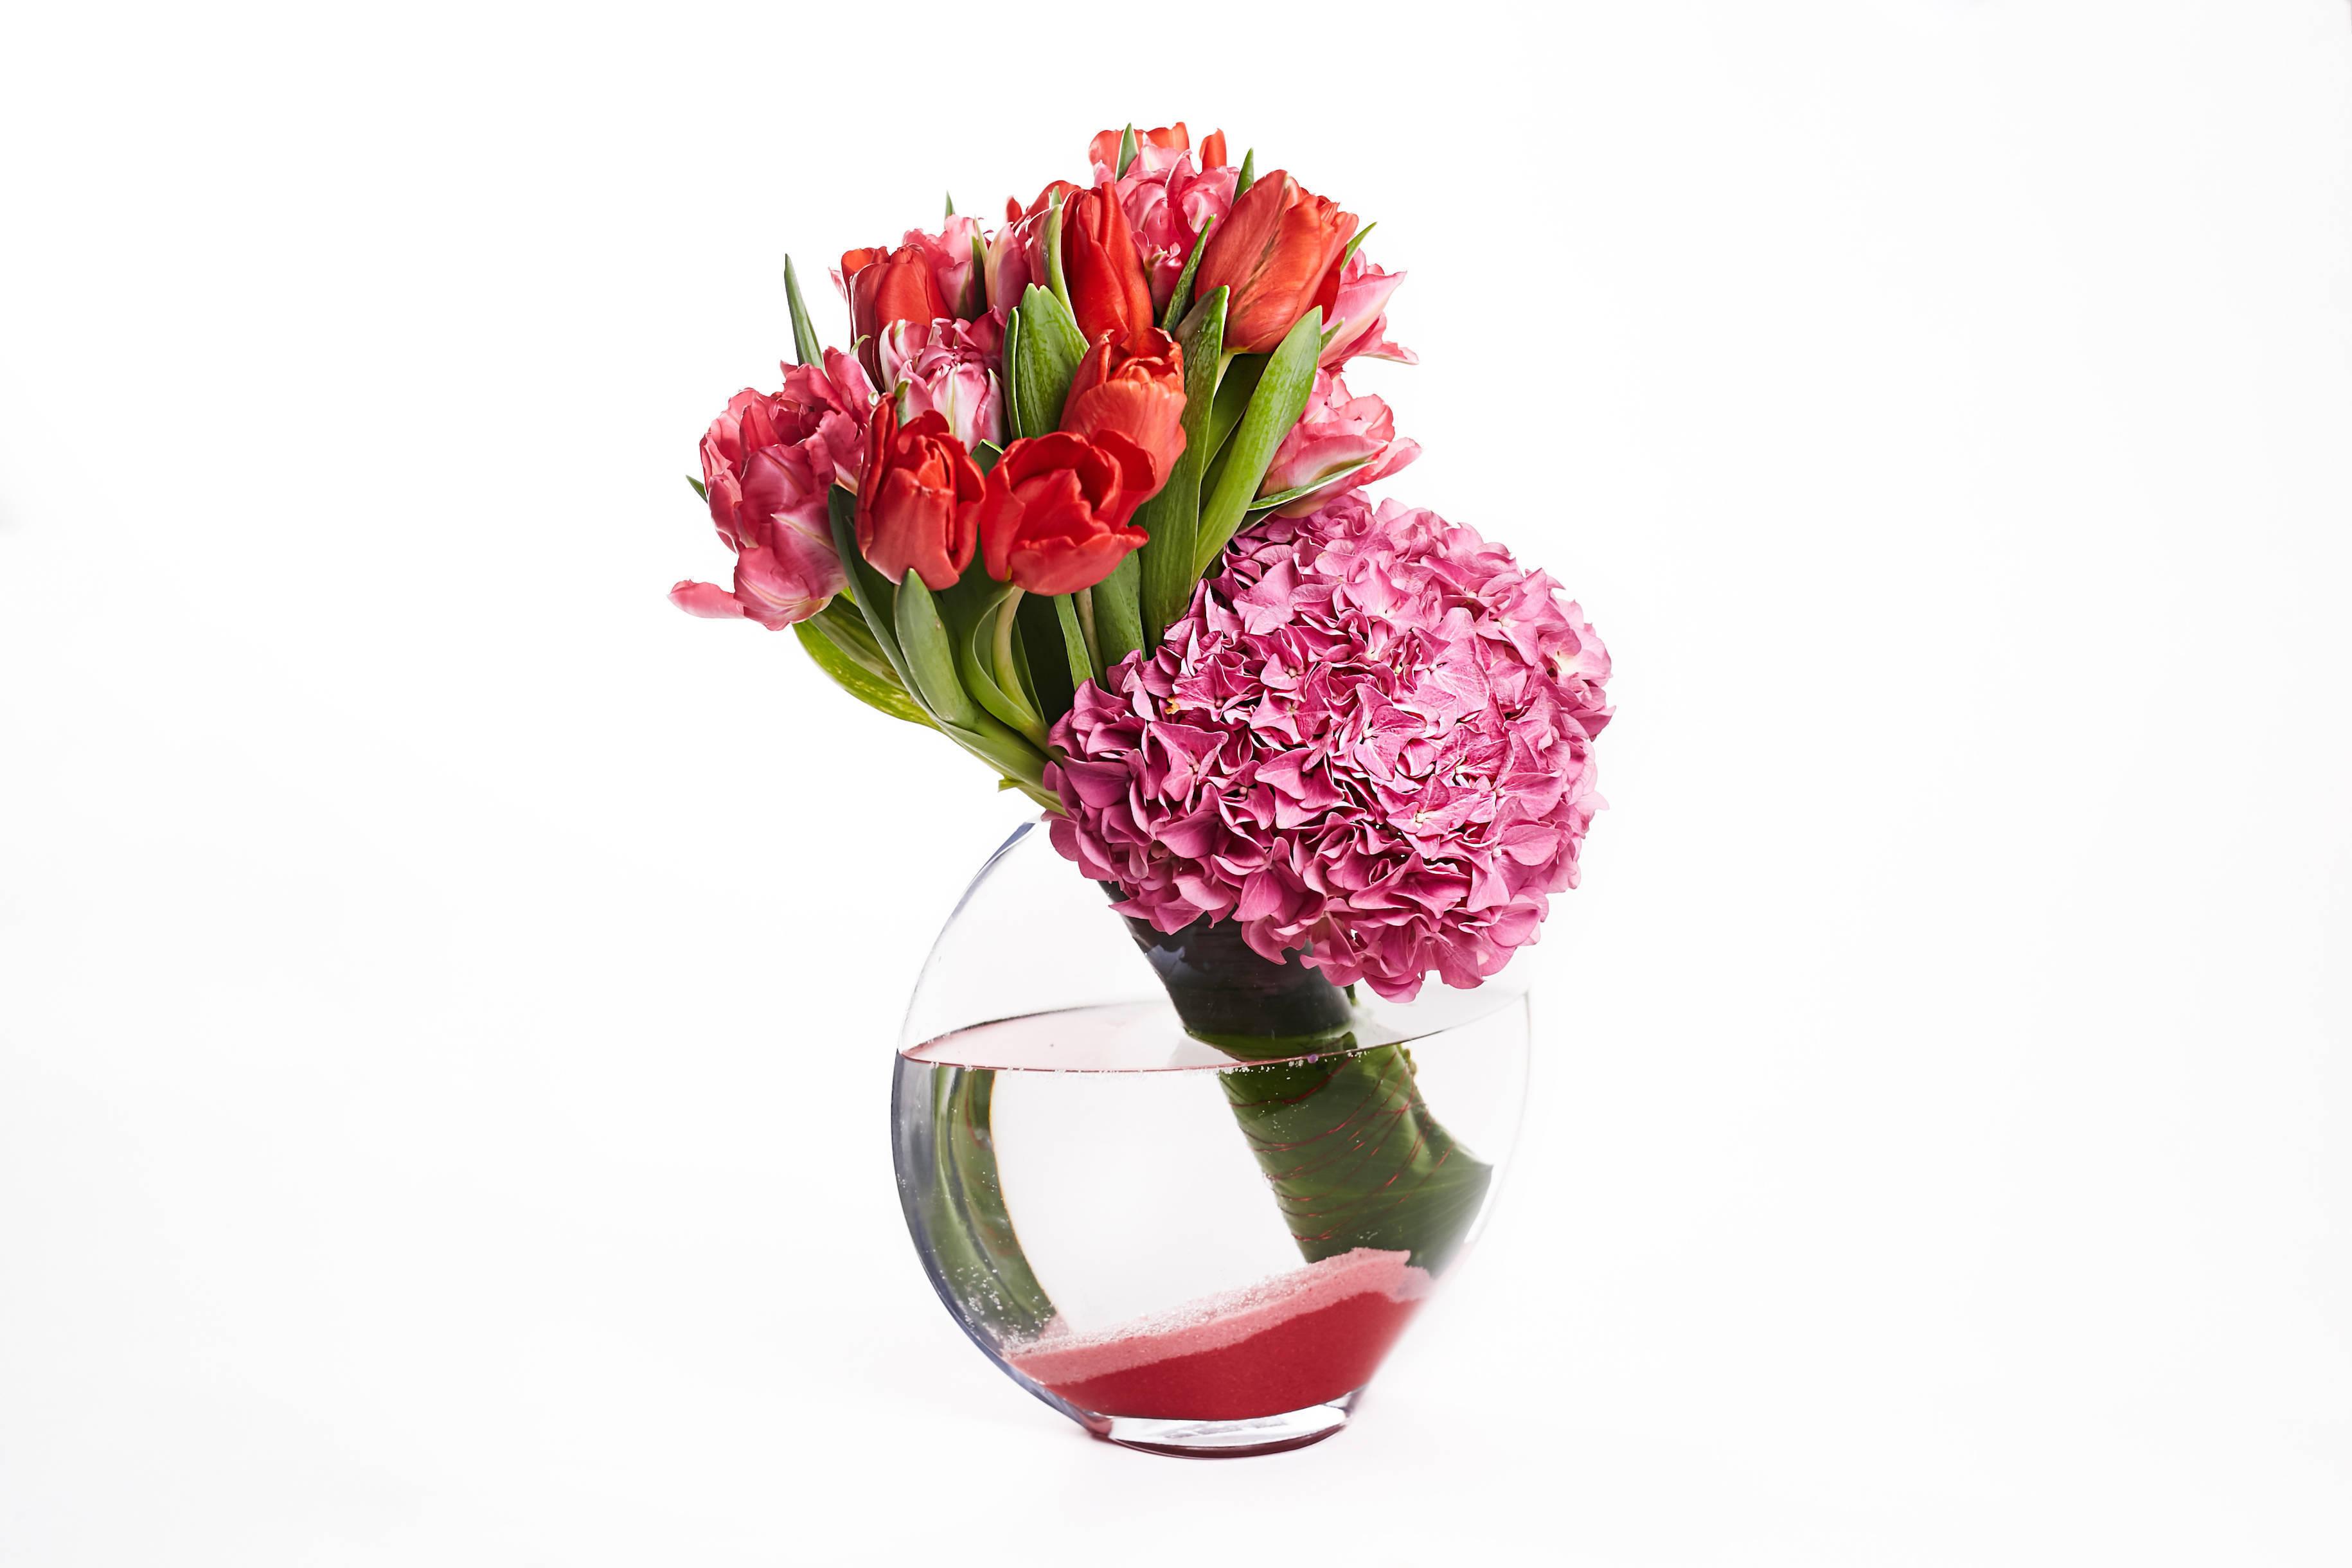 4697e767d53415385577_a8d6baa901720dcfe2de_sahola__tulips.jpg